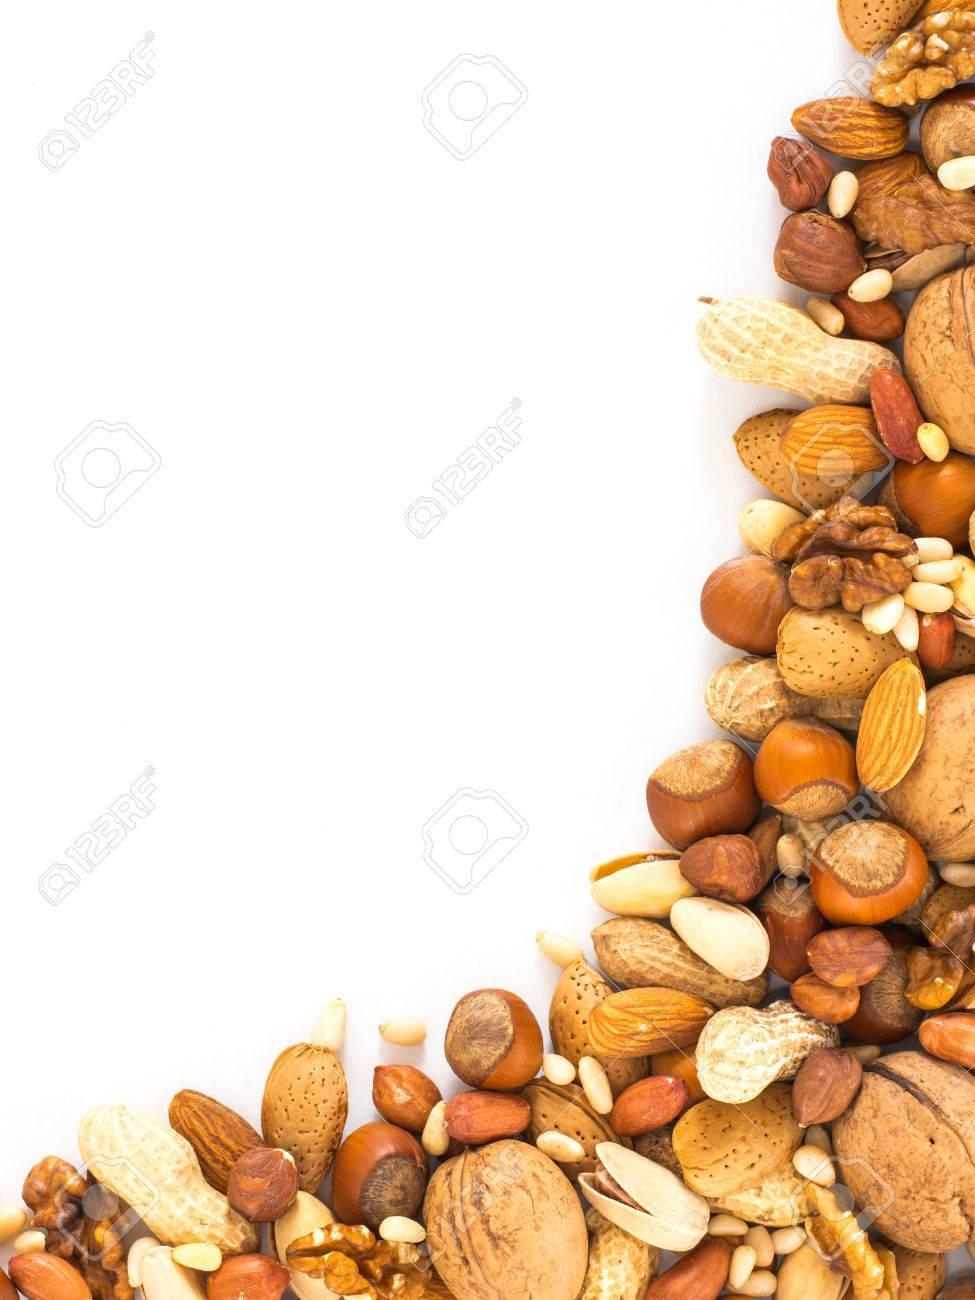 Background of mixed nuts - hazelnuts, almonds, walnuts, pistachios,